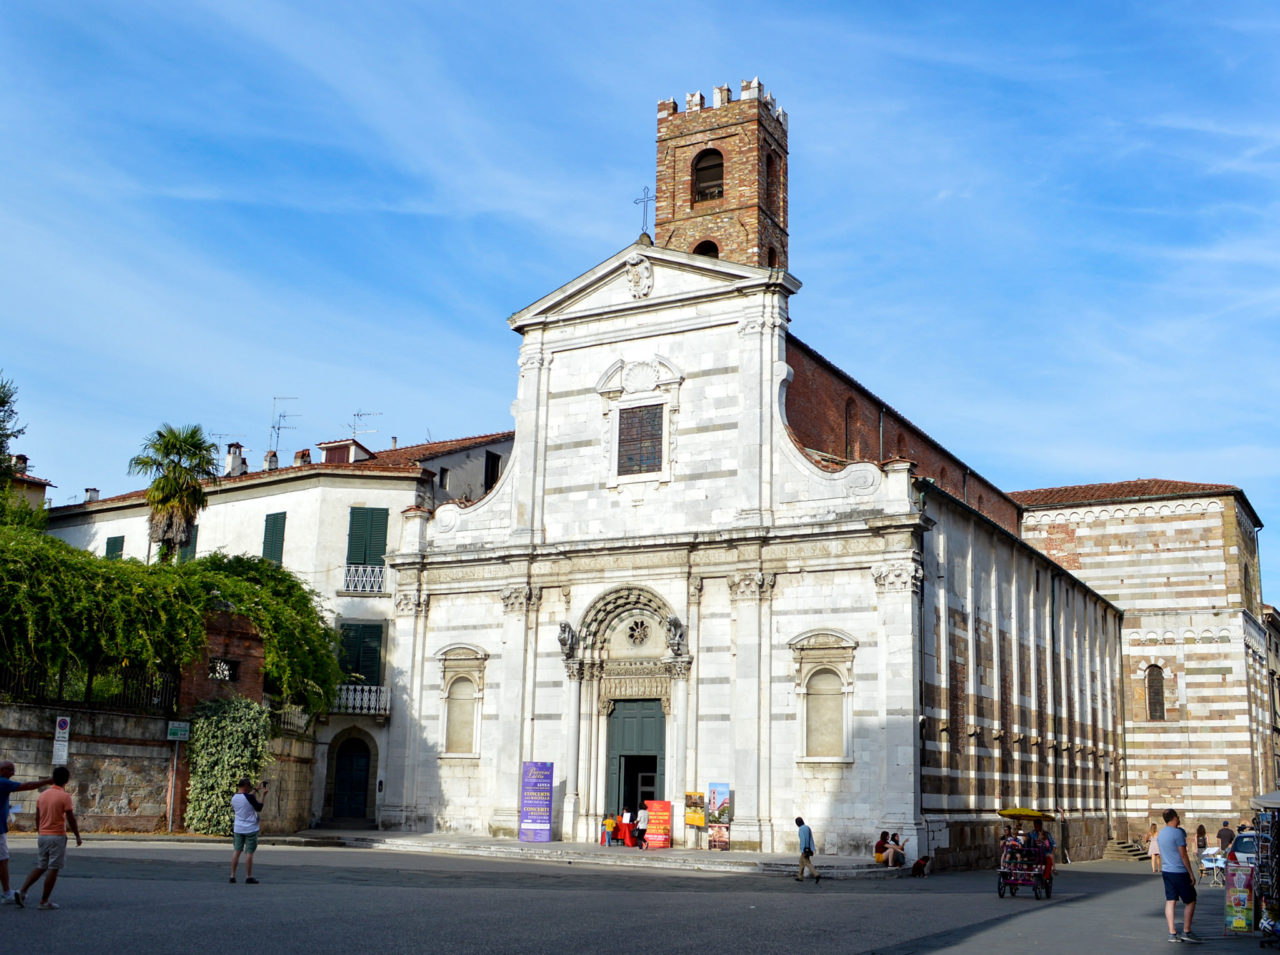 Церковь Святых Иоанна и Репараты (Chiesa dei Santi Giovanni e Reparata)